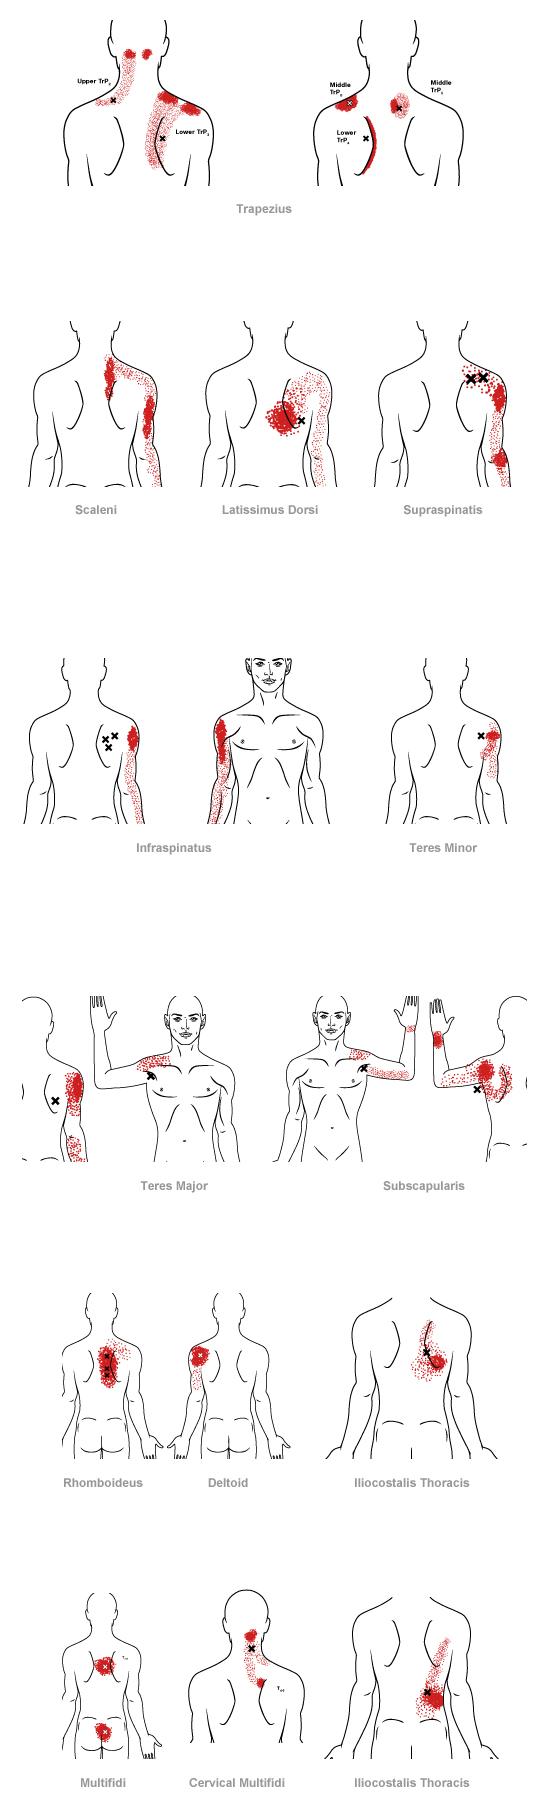 midback myofascial pain.jpg